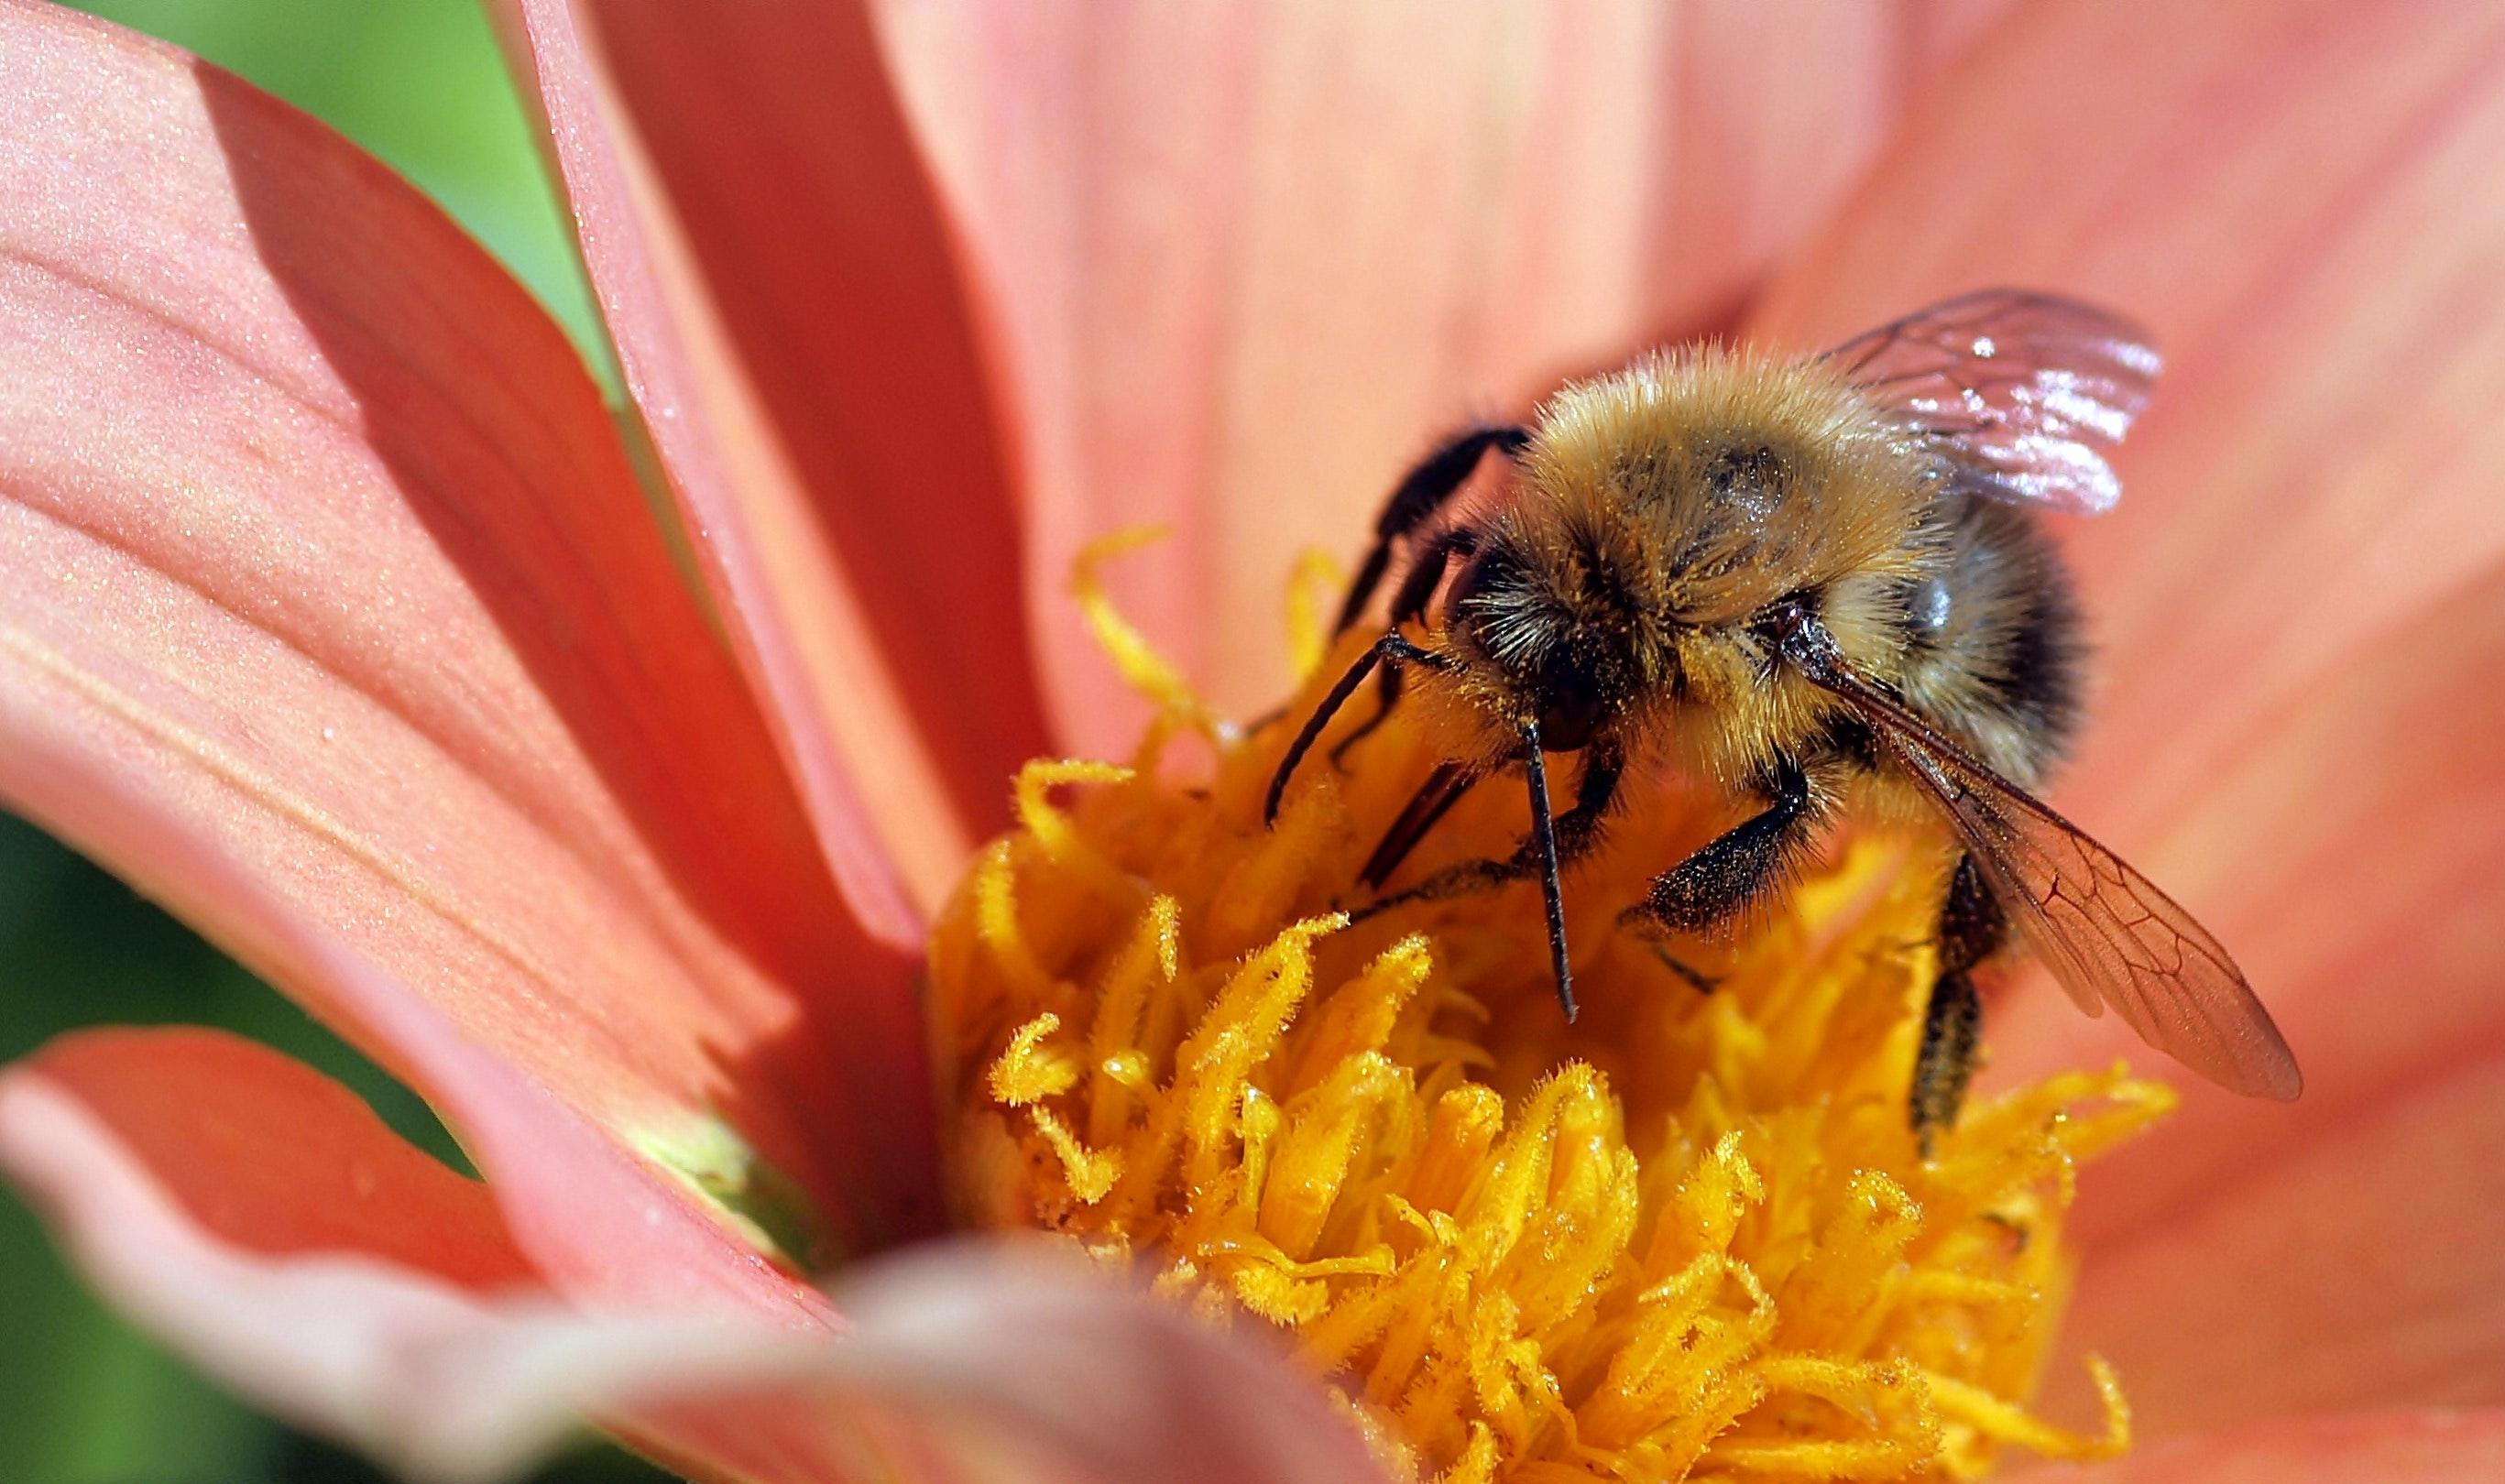 Yellow and Black Bee, Honey, Work, Vibrant, Summer, HQ Photo